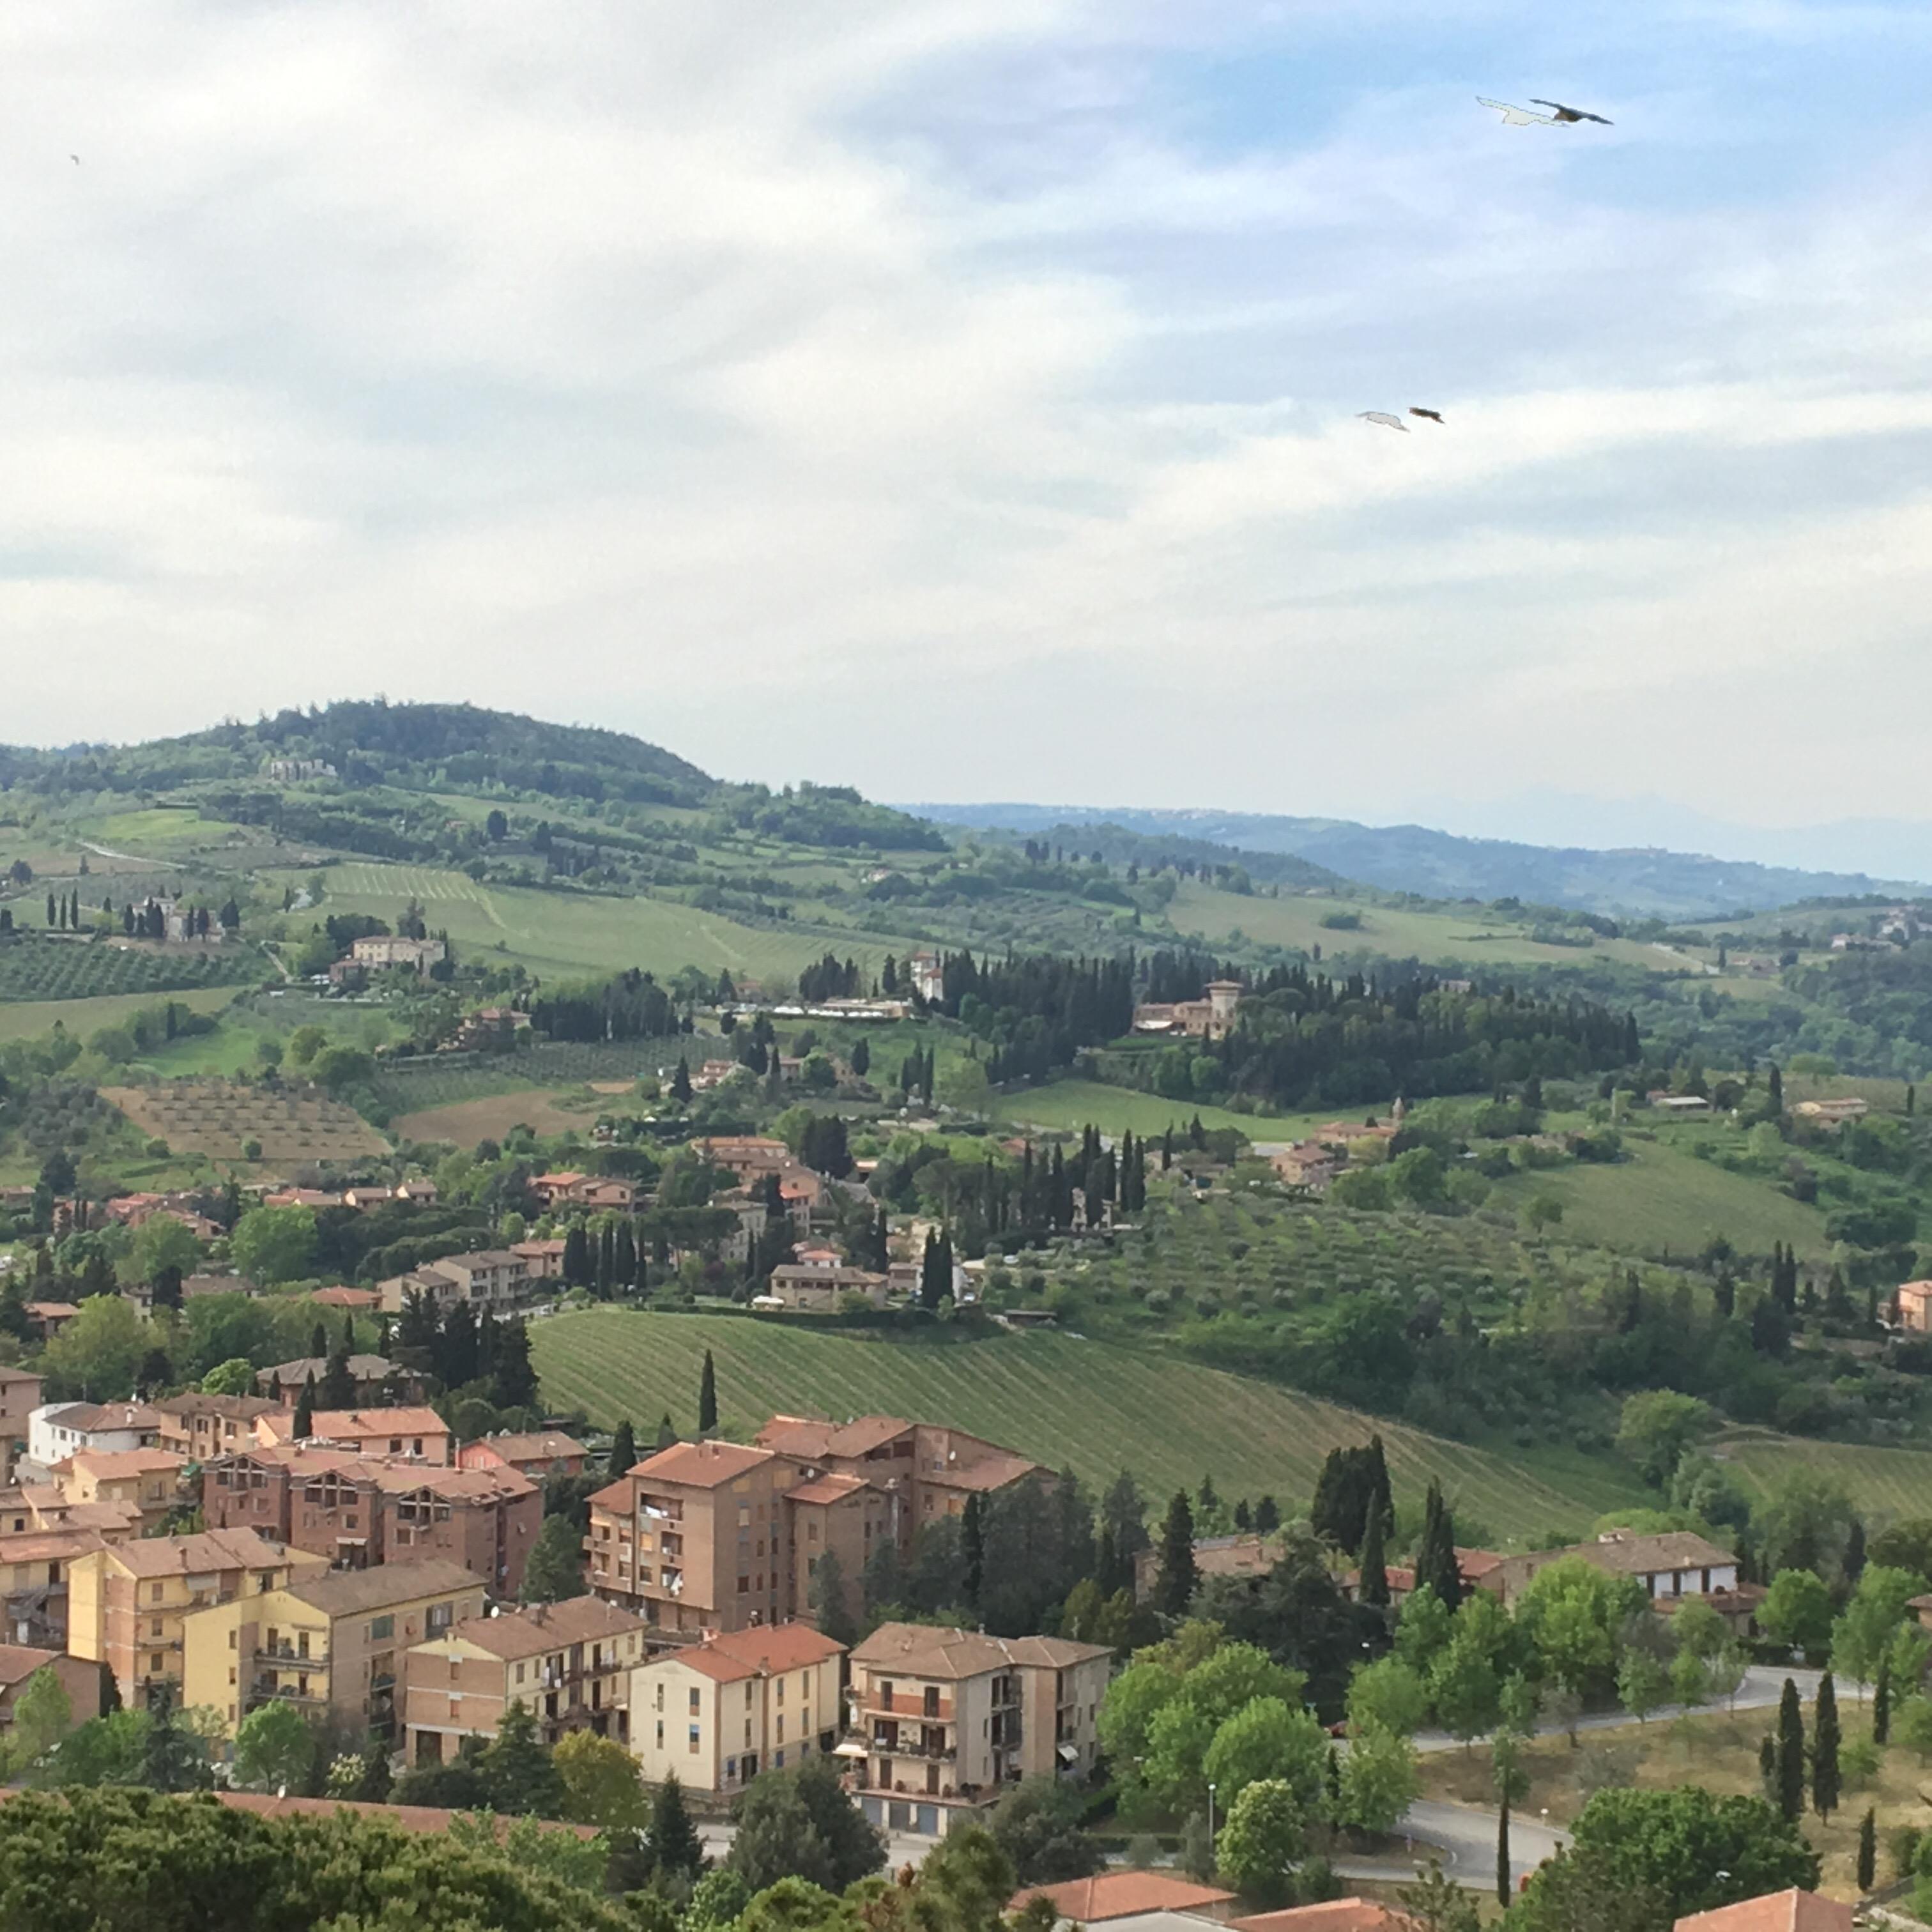 Travel: Tuscany – Monteriggioni, Siena and San Gimignano